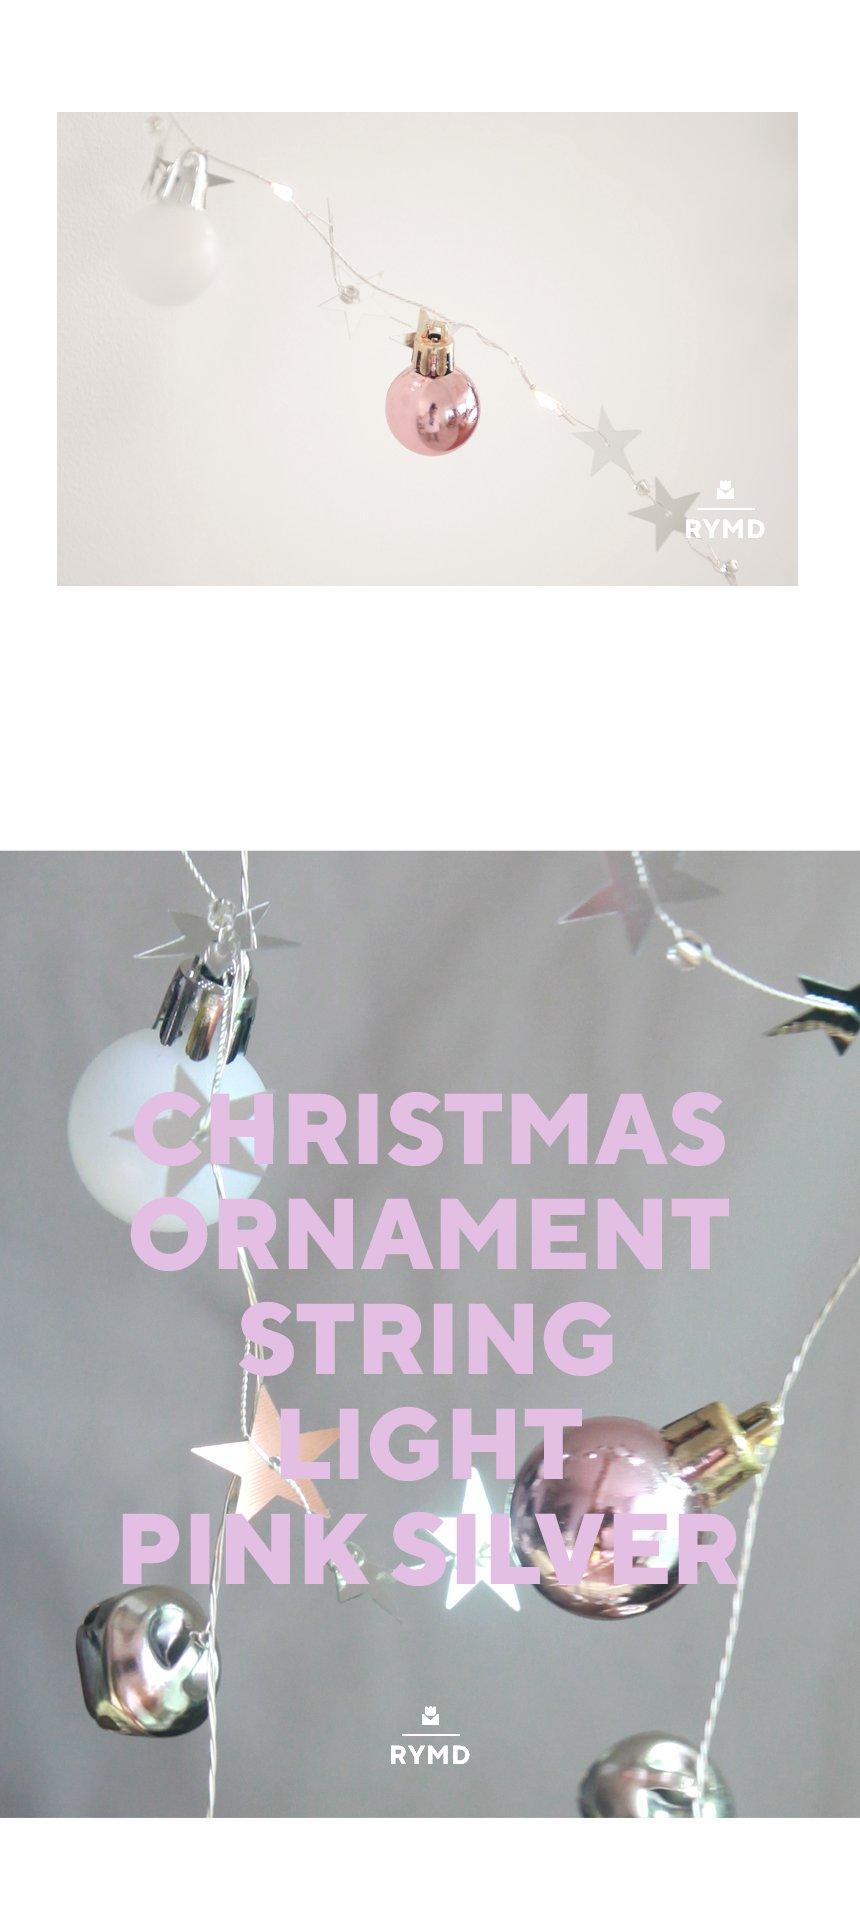 CHRISTMAS_ORNAMENT_STRING_LIGHT_PINK_SILVER_08.jpg